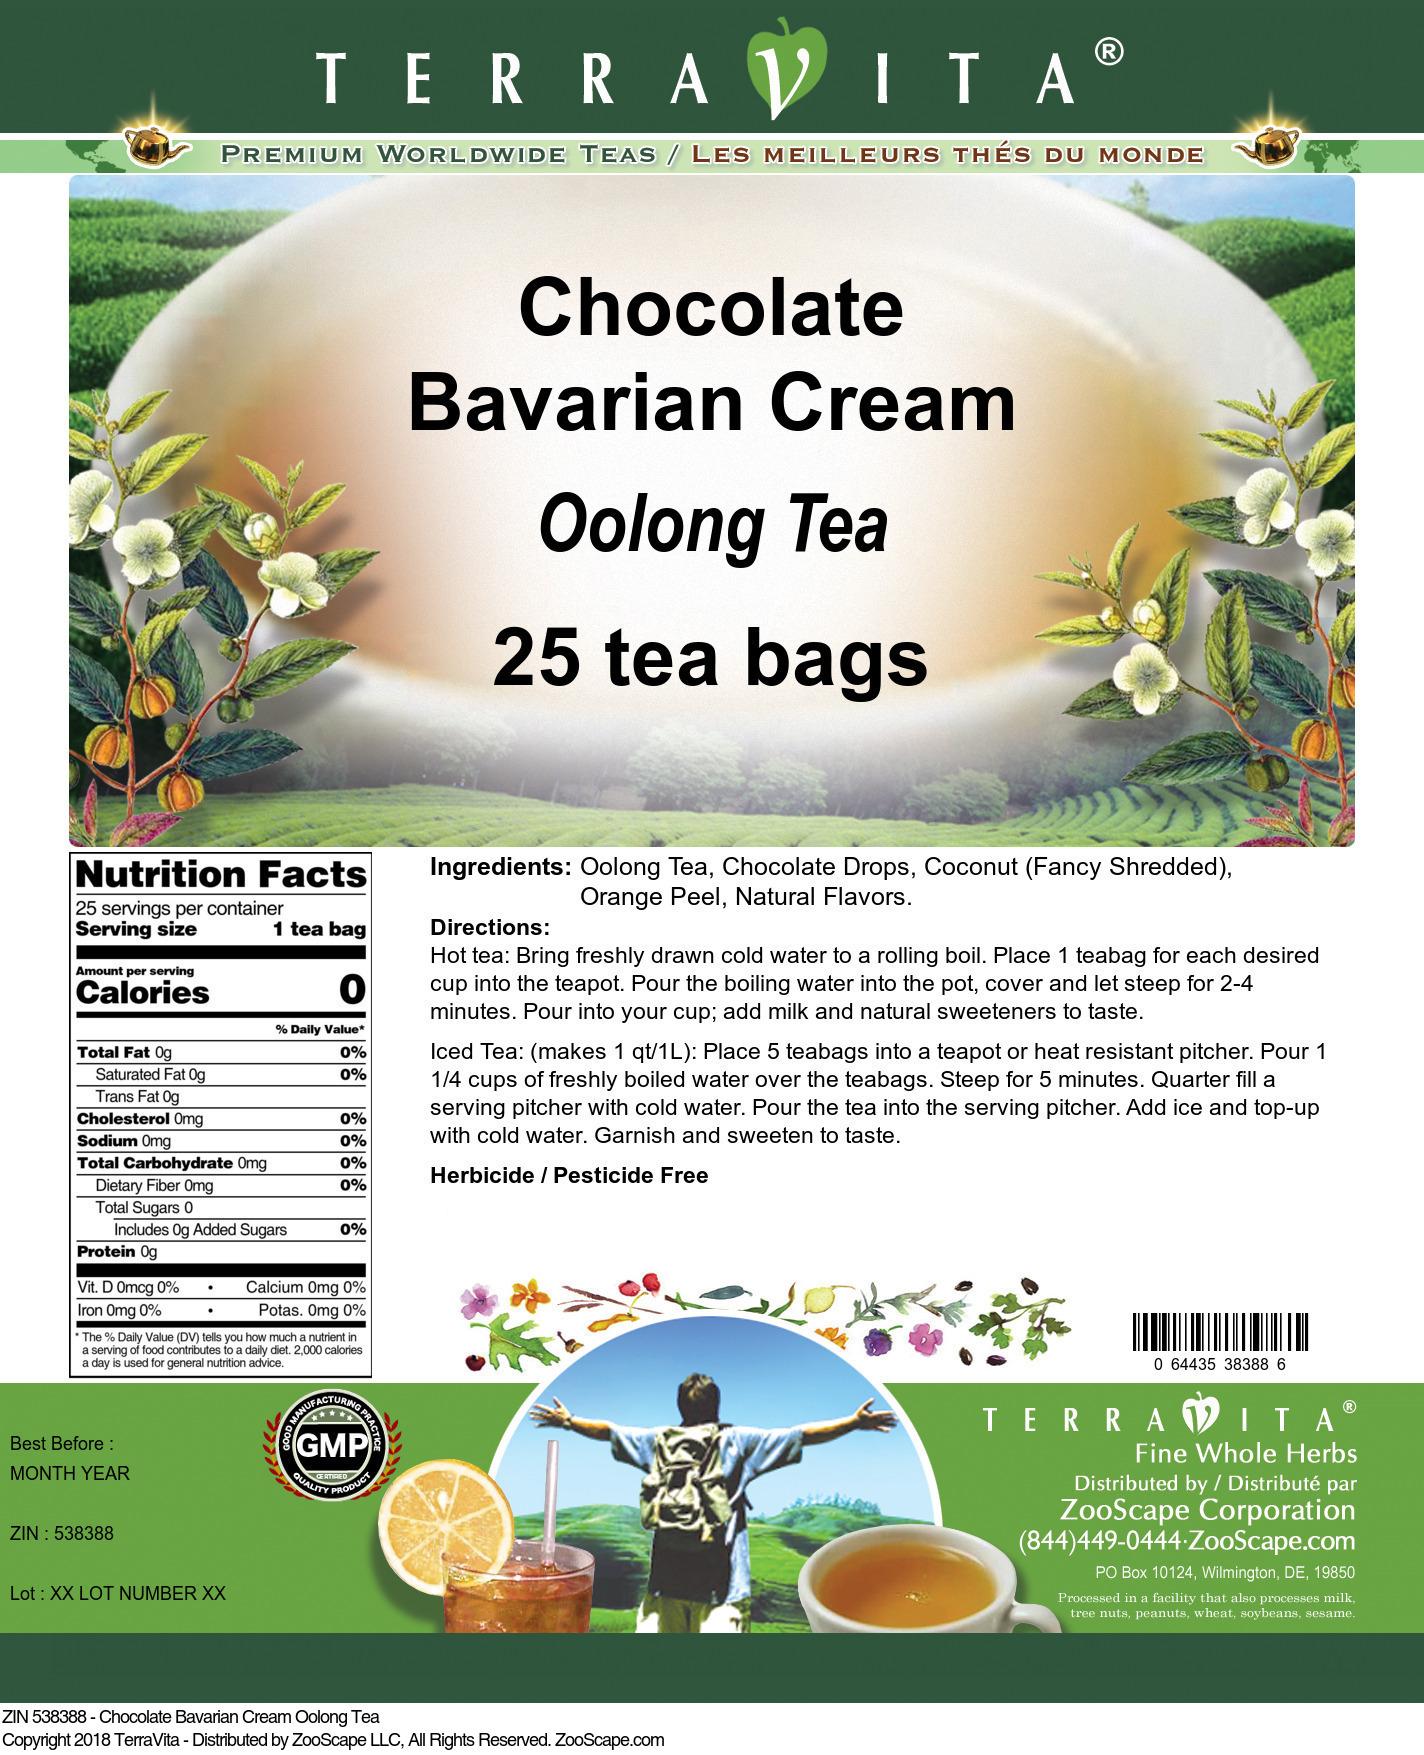 Chocolate Bavarian Cream Oolong Tea